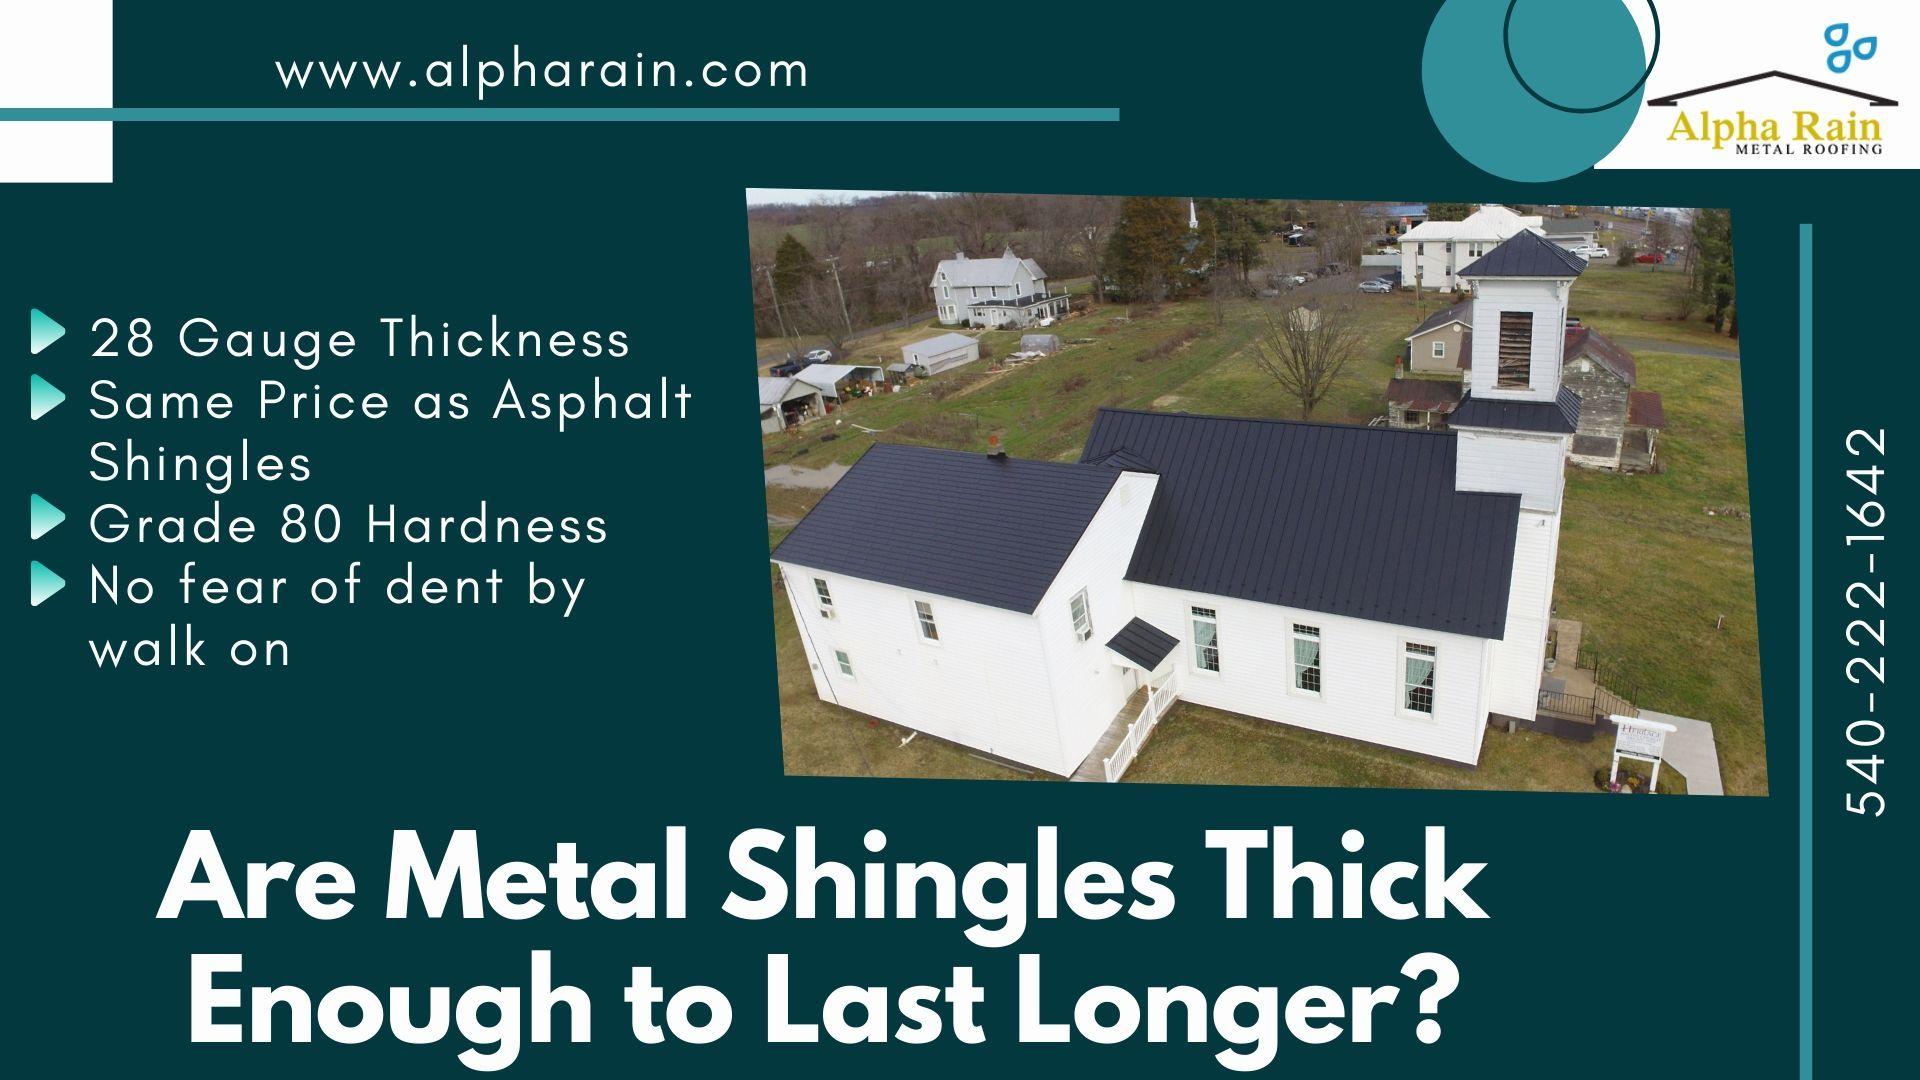 Are Metal Roof Shingles Thick Enough To Last Longer Than An Asphalt Roof In 2020 Shingling Metal Shingle Roof Metal Shingles